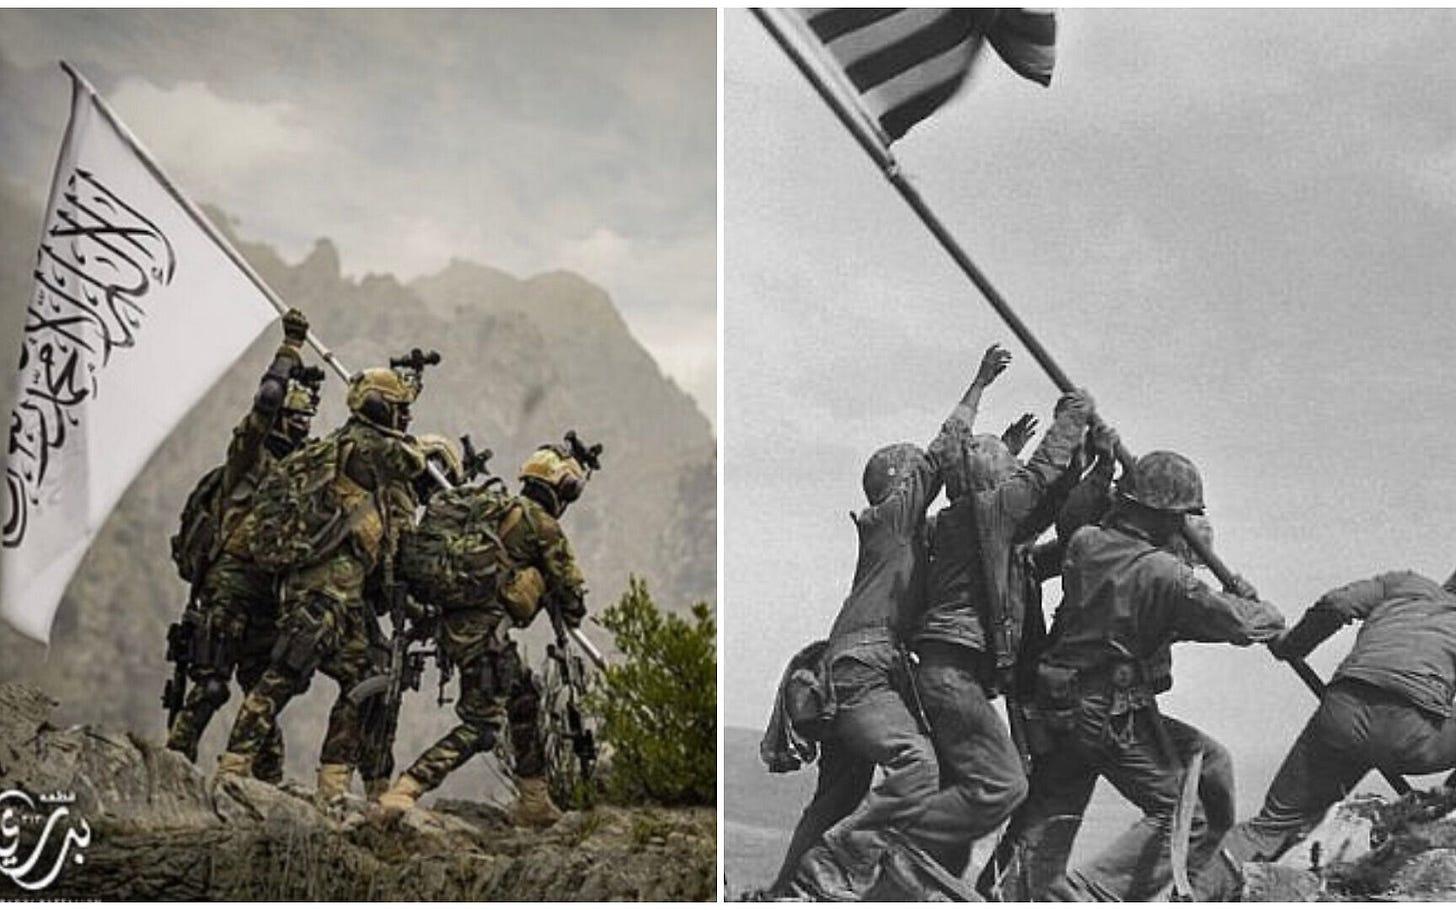 Taliban image said to mock iconic photo of US flag-raising on Iwo Jima |  The Times of Israel